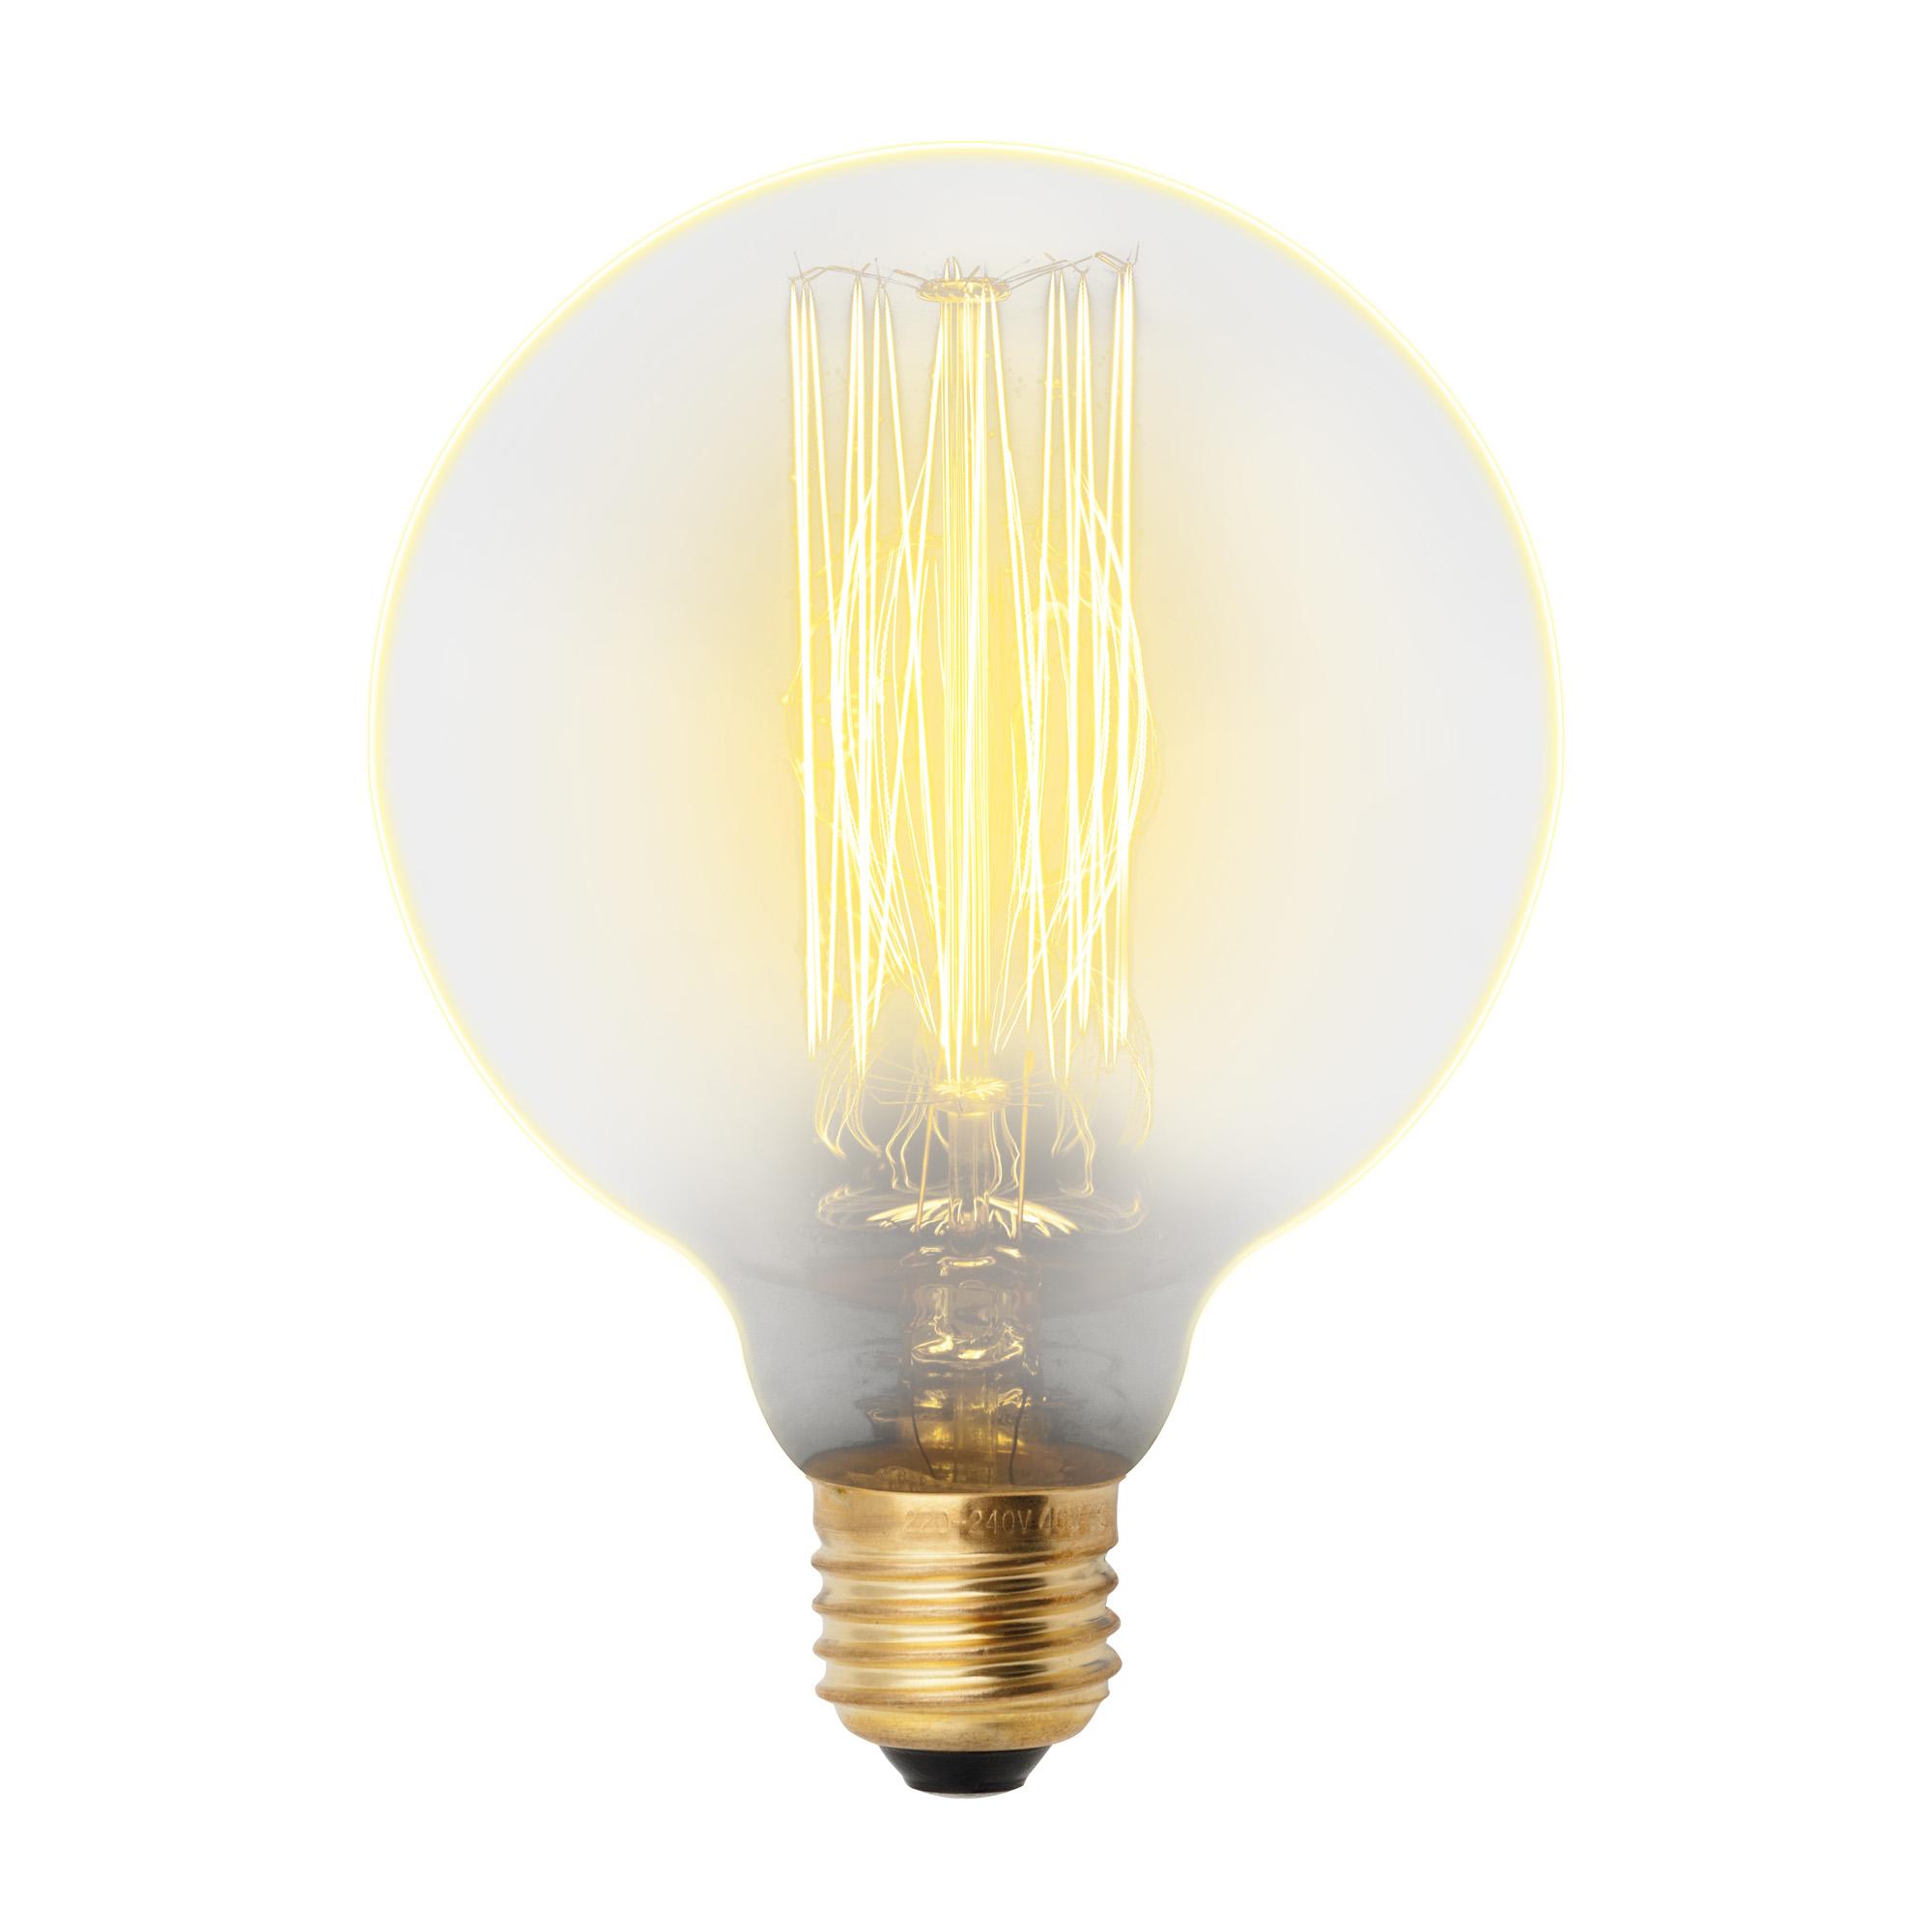 Лампа накаливания Uniel Vintage il-v-g95-60/golden/e27 vw01 10шт